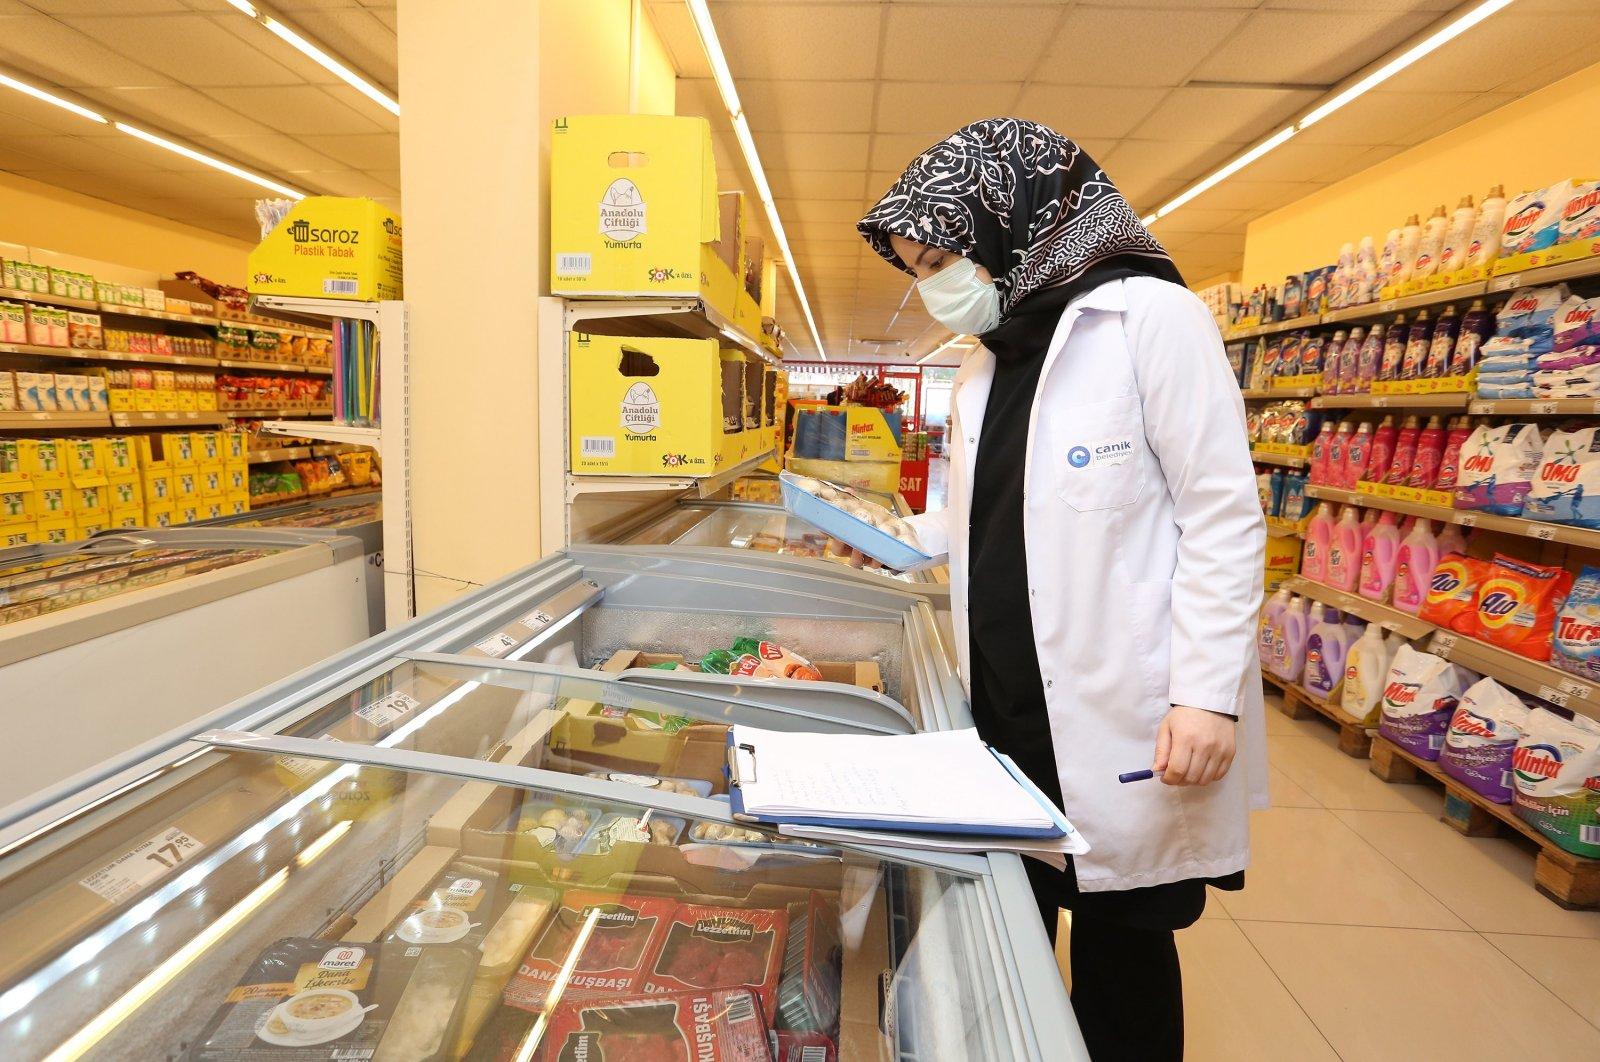 Municipality staff conducts an audit at a supermarket in the Black Sea province of Samsun, northern Turkey, Feb. 3, 2021. (IHA Photo)